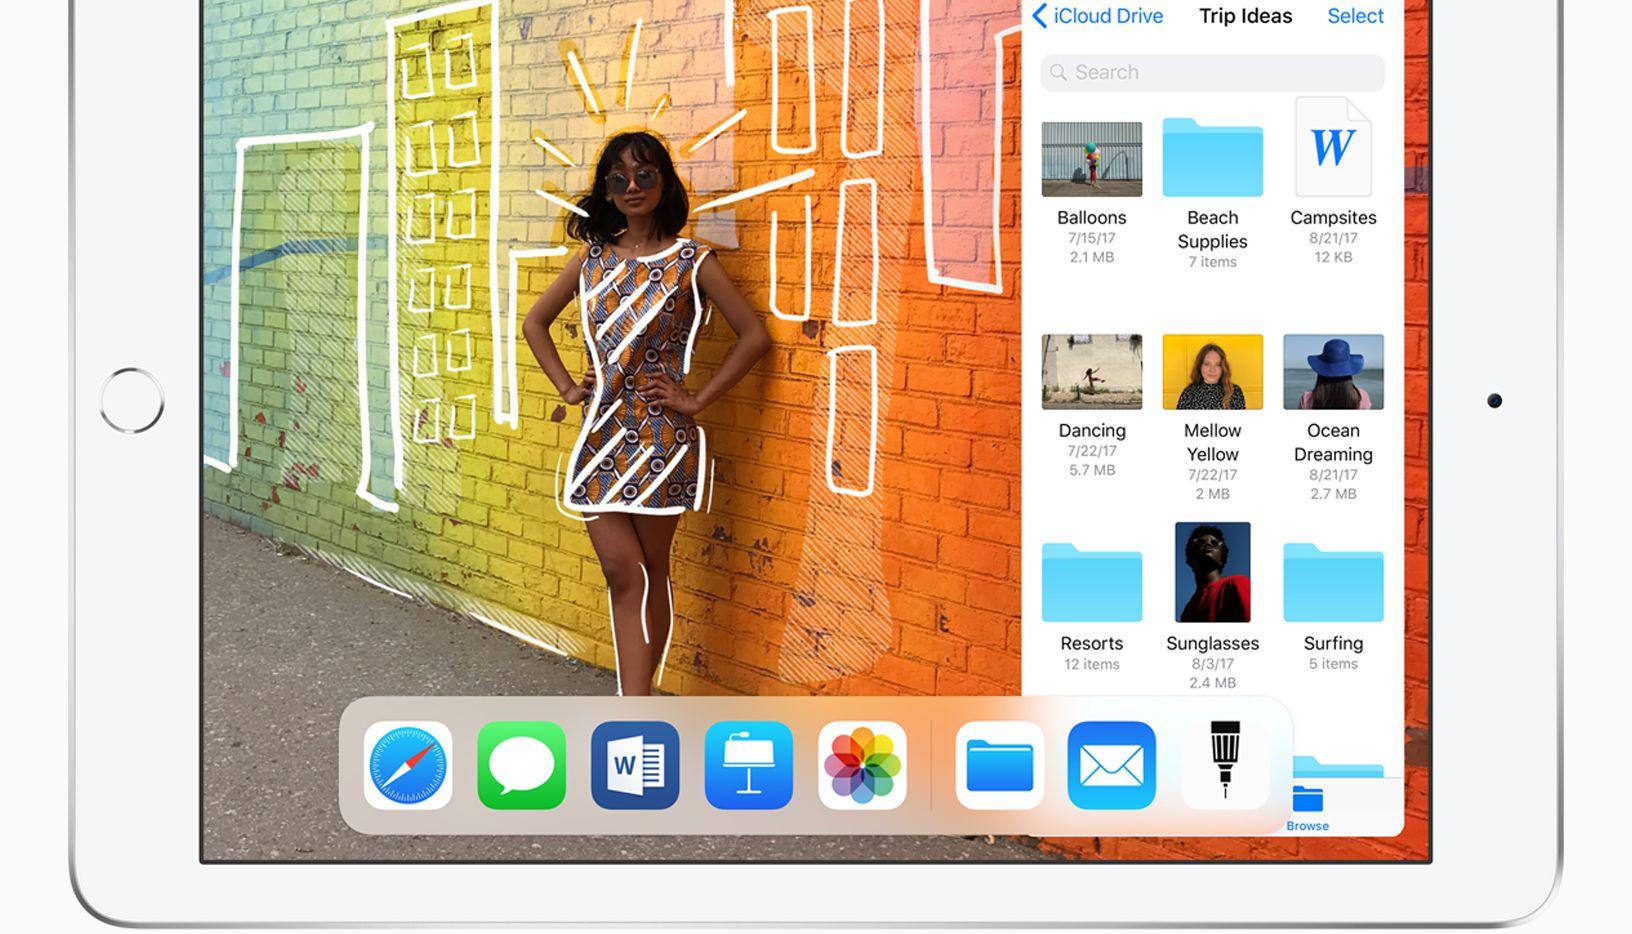 The 2018 Apple iPad with Apple Pencil